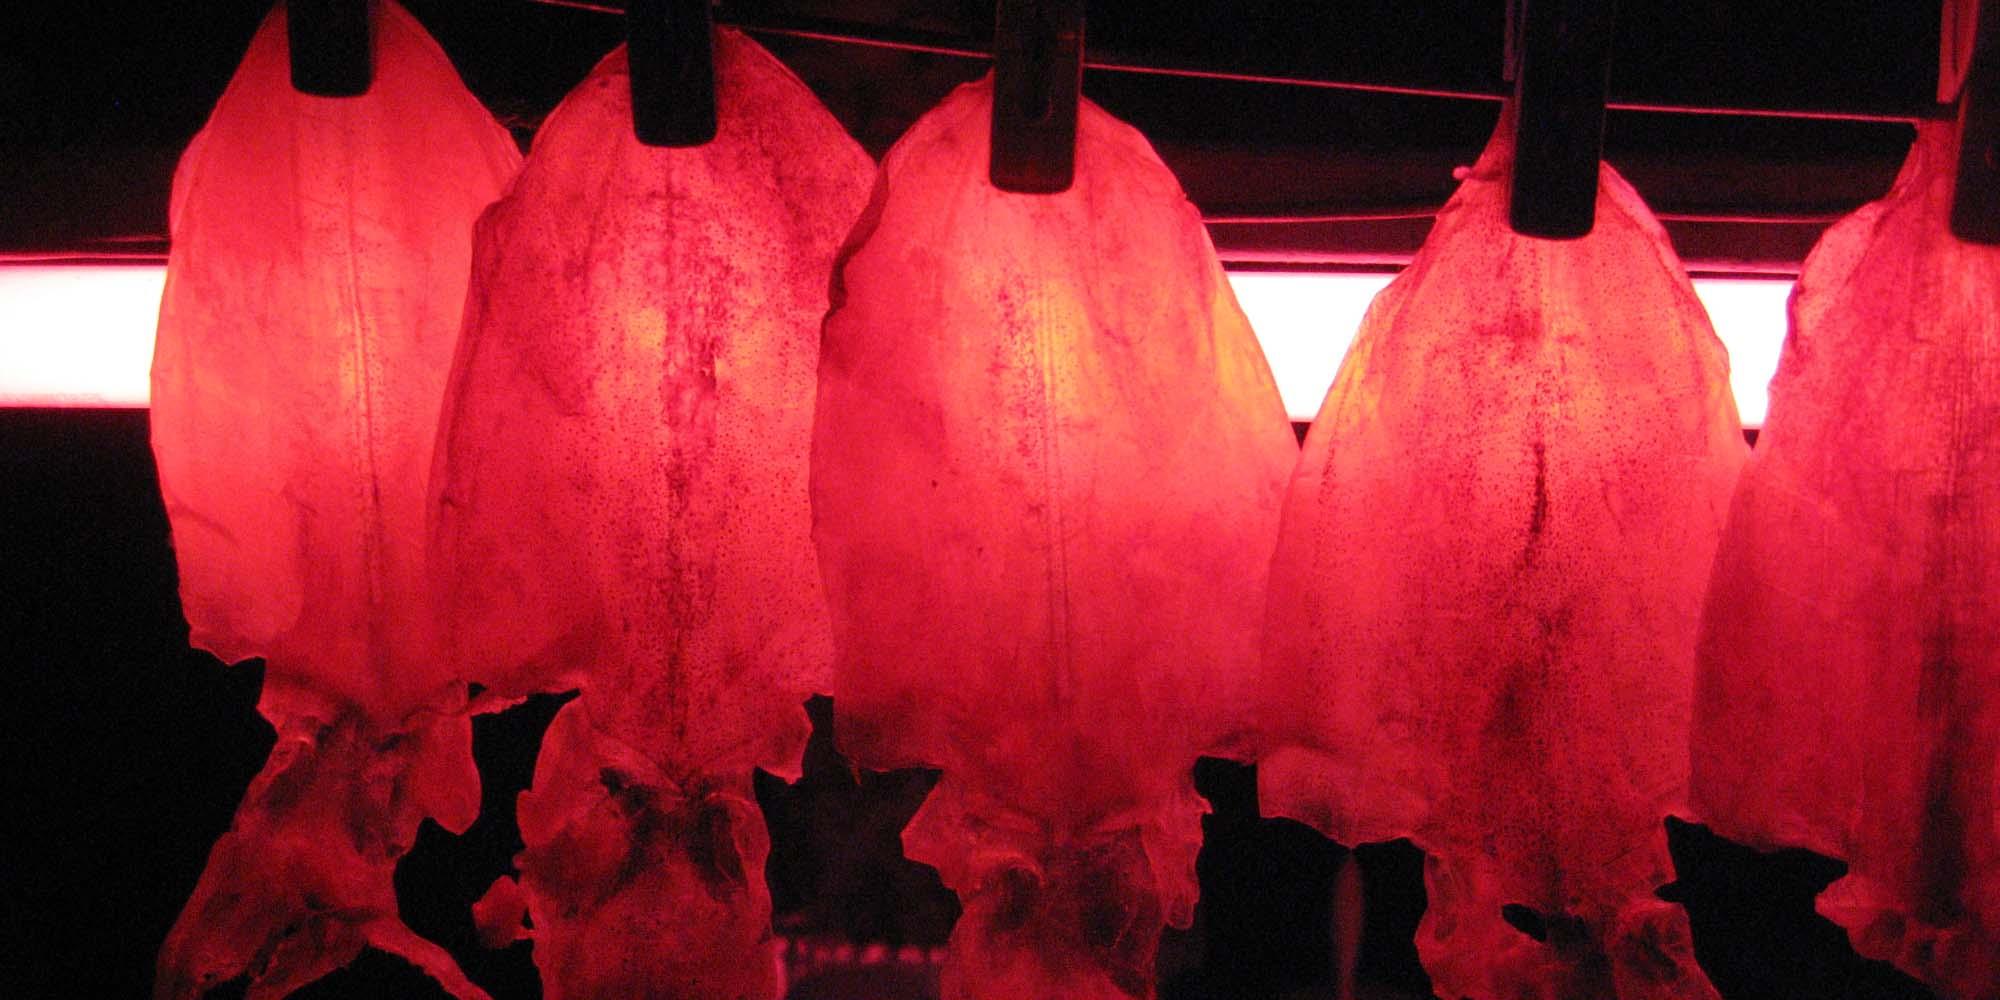 phuket-red.jpg